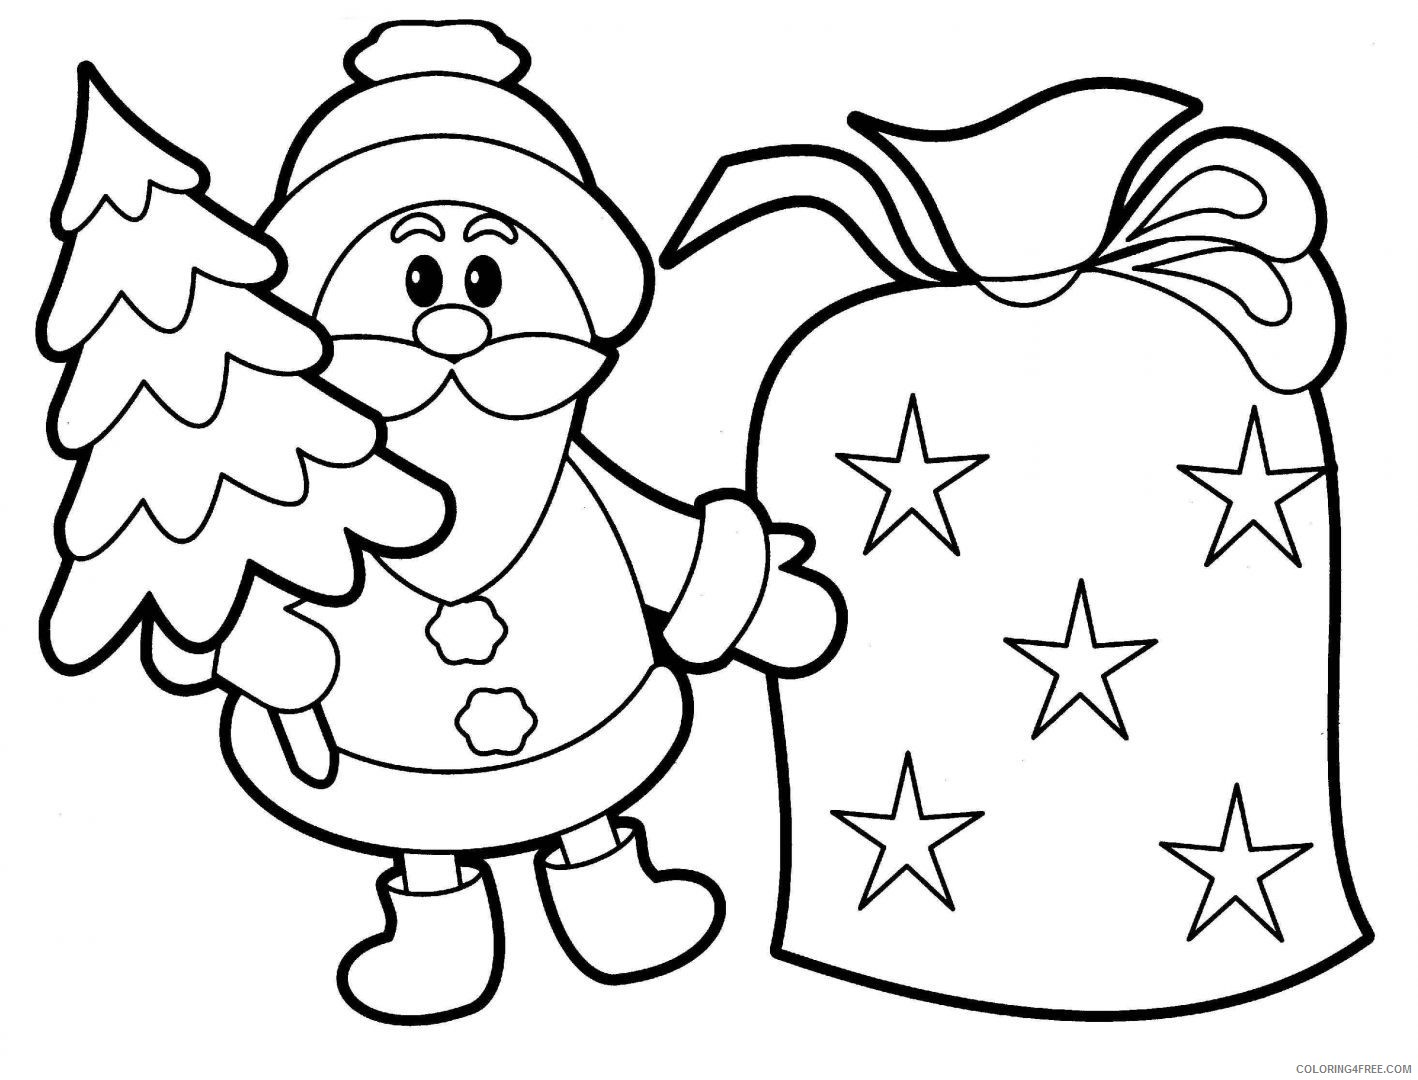 santa claus coloring pages printable Coloring4free